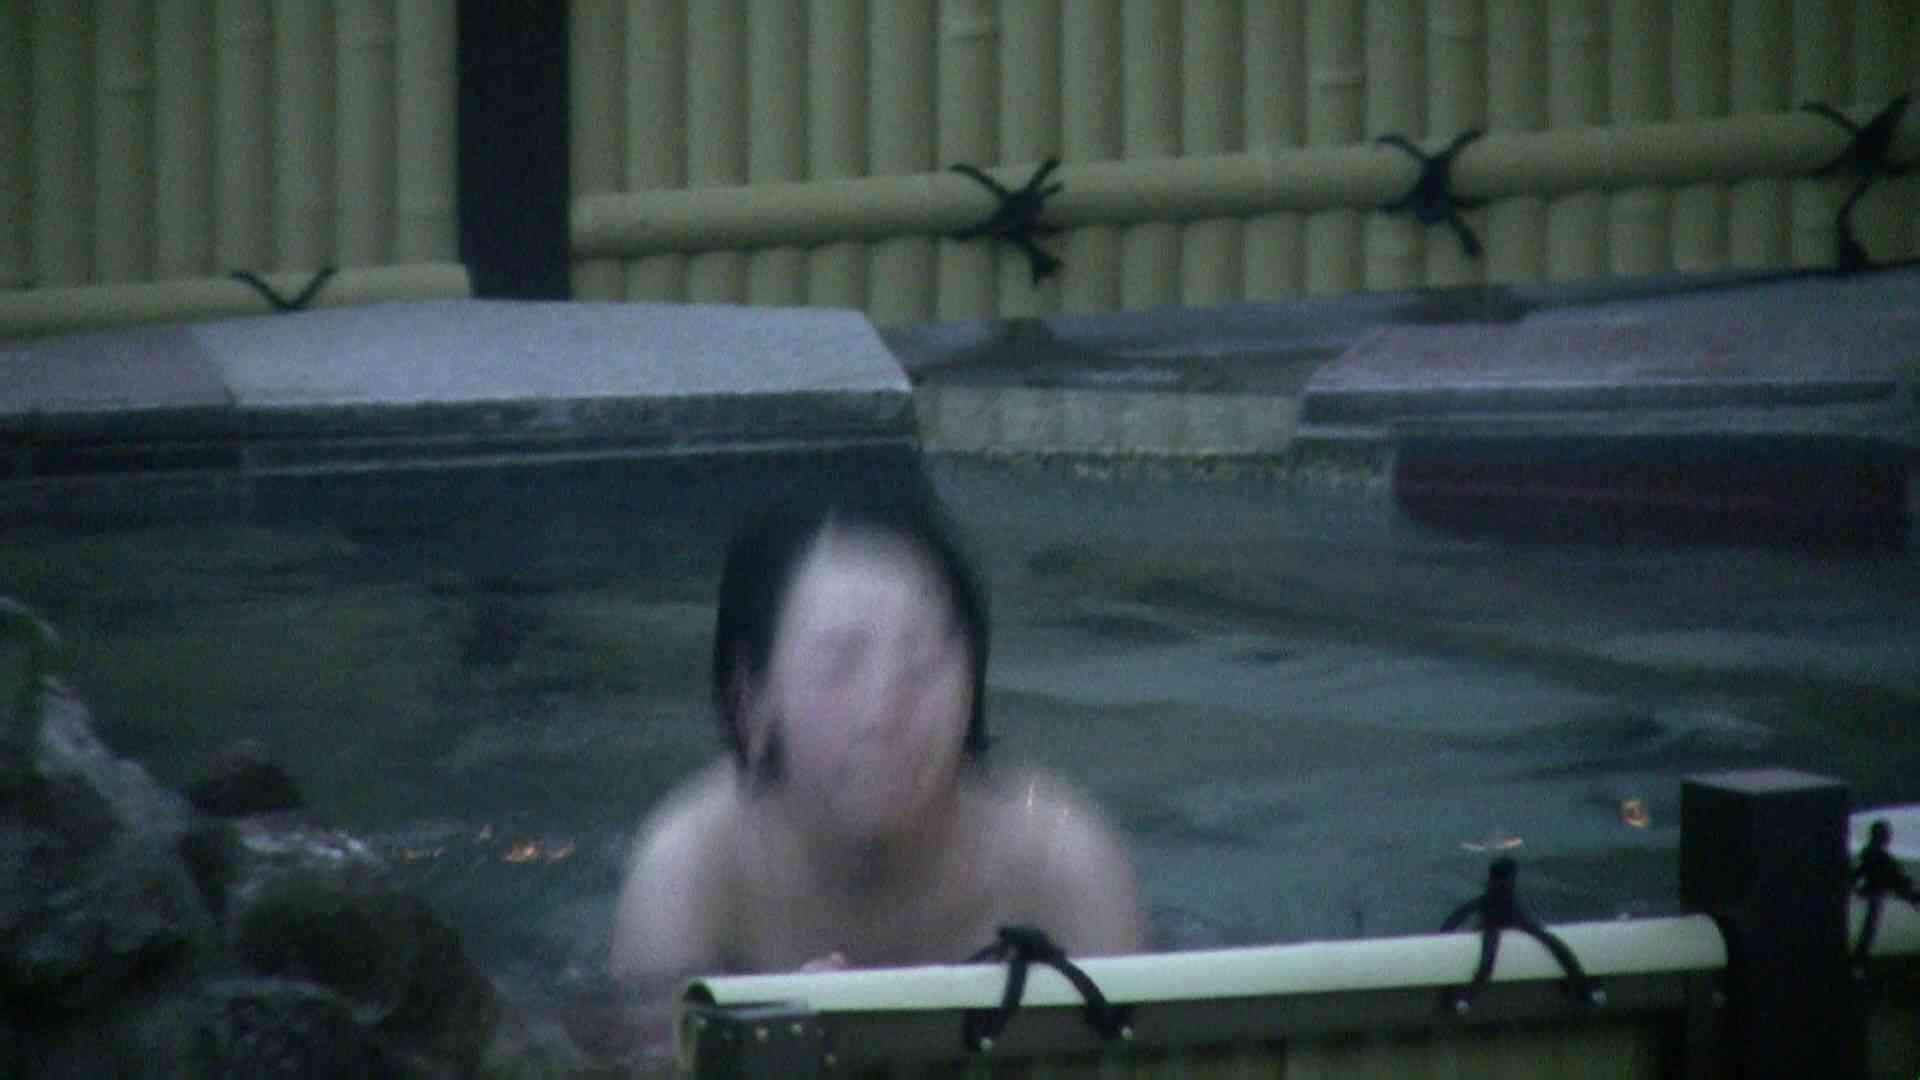 Aquaな露天風呂Vol.05【VIP】 露天風呂編 | 盗撮シリーズ  112PIX 27